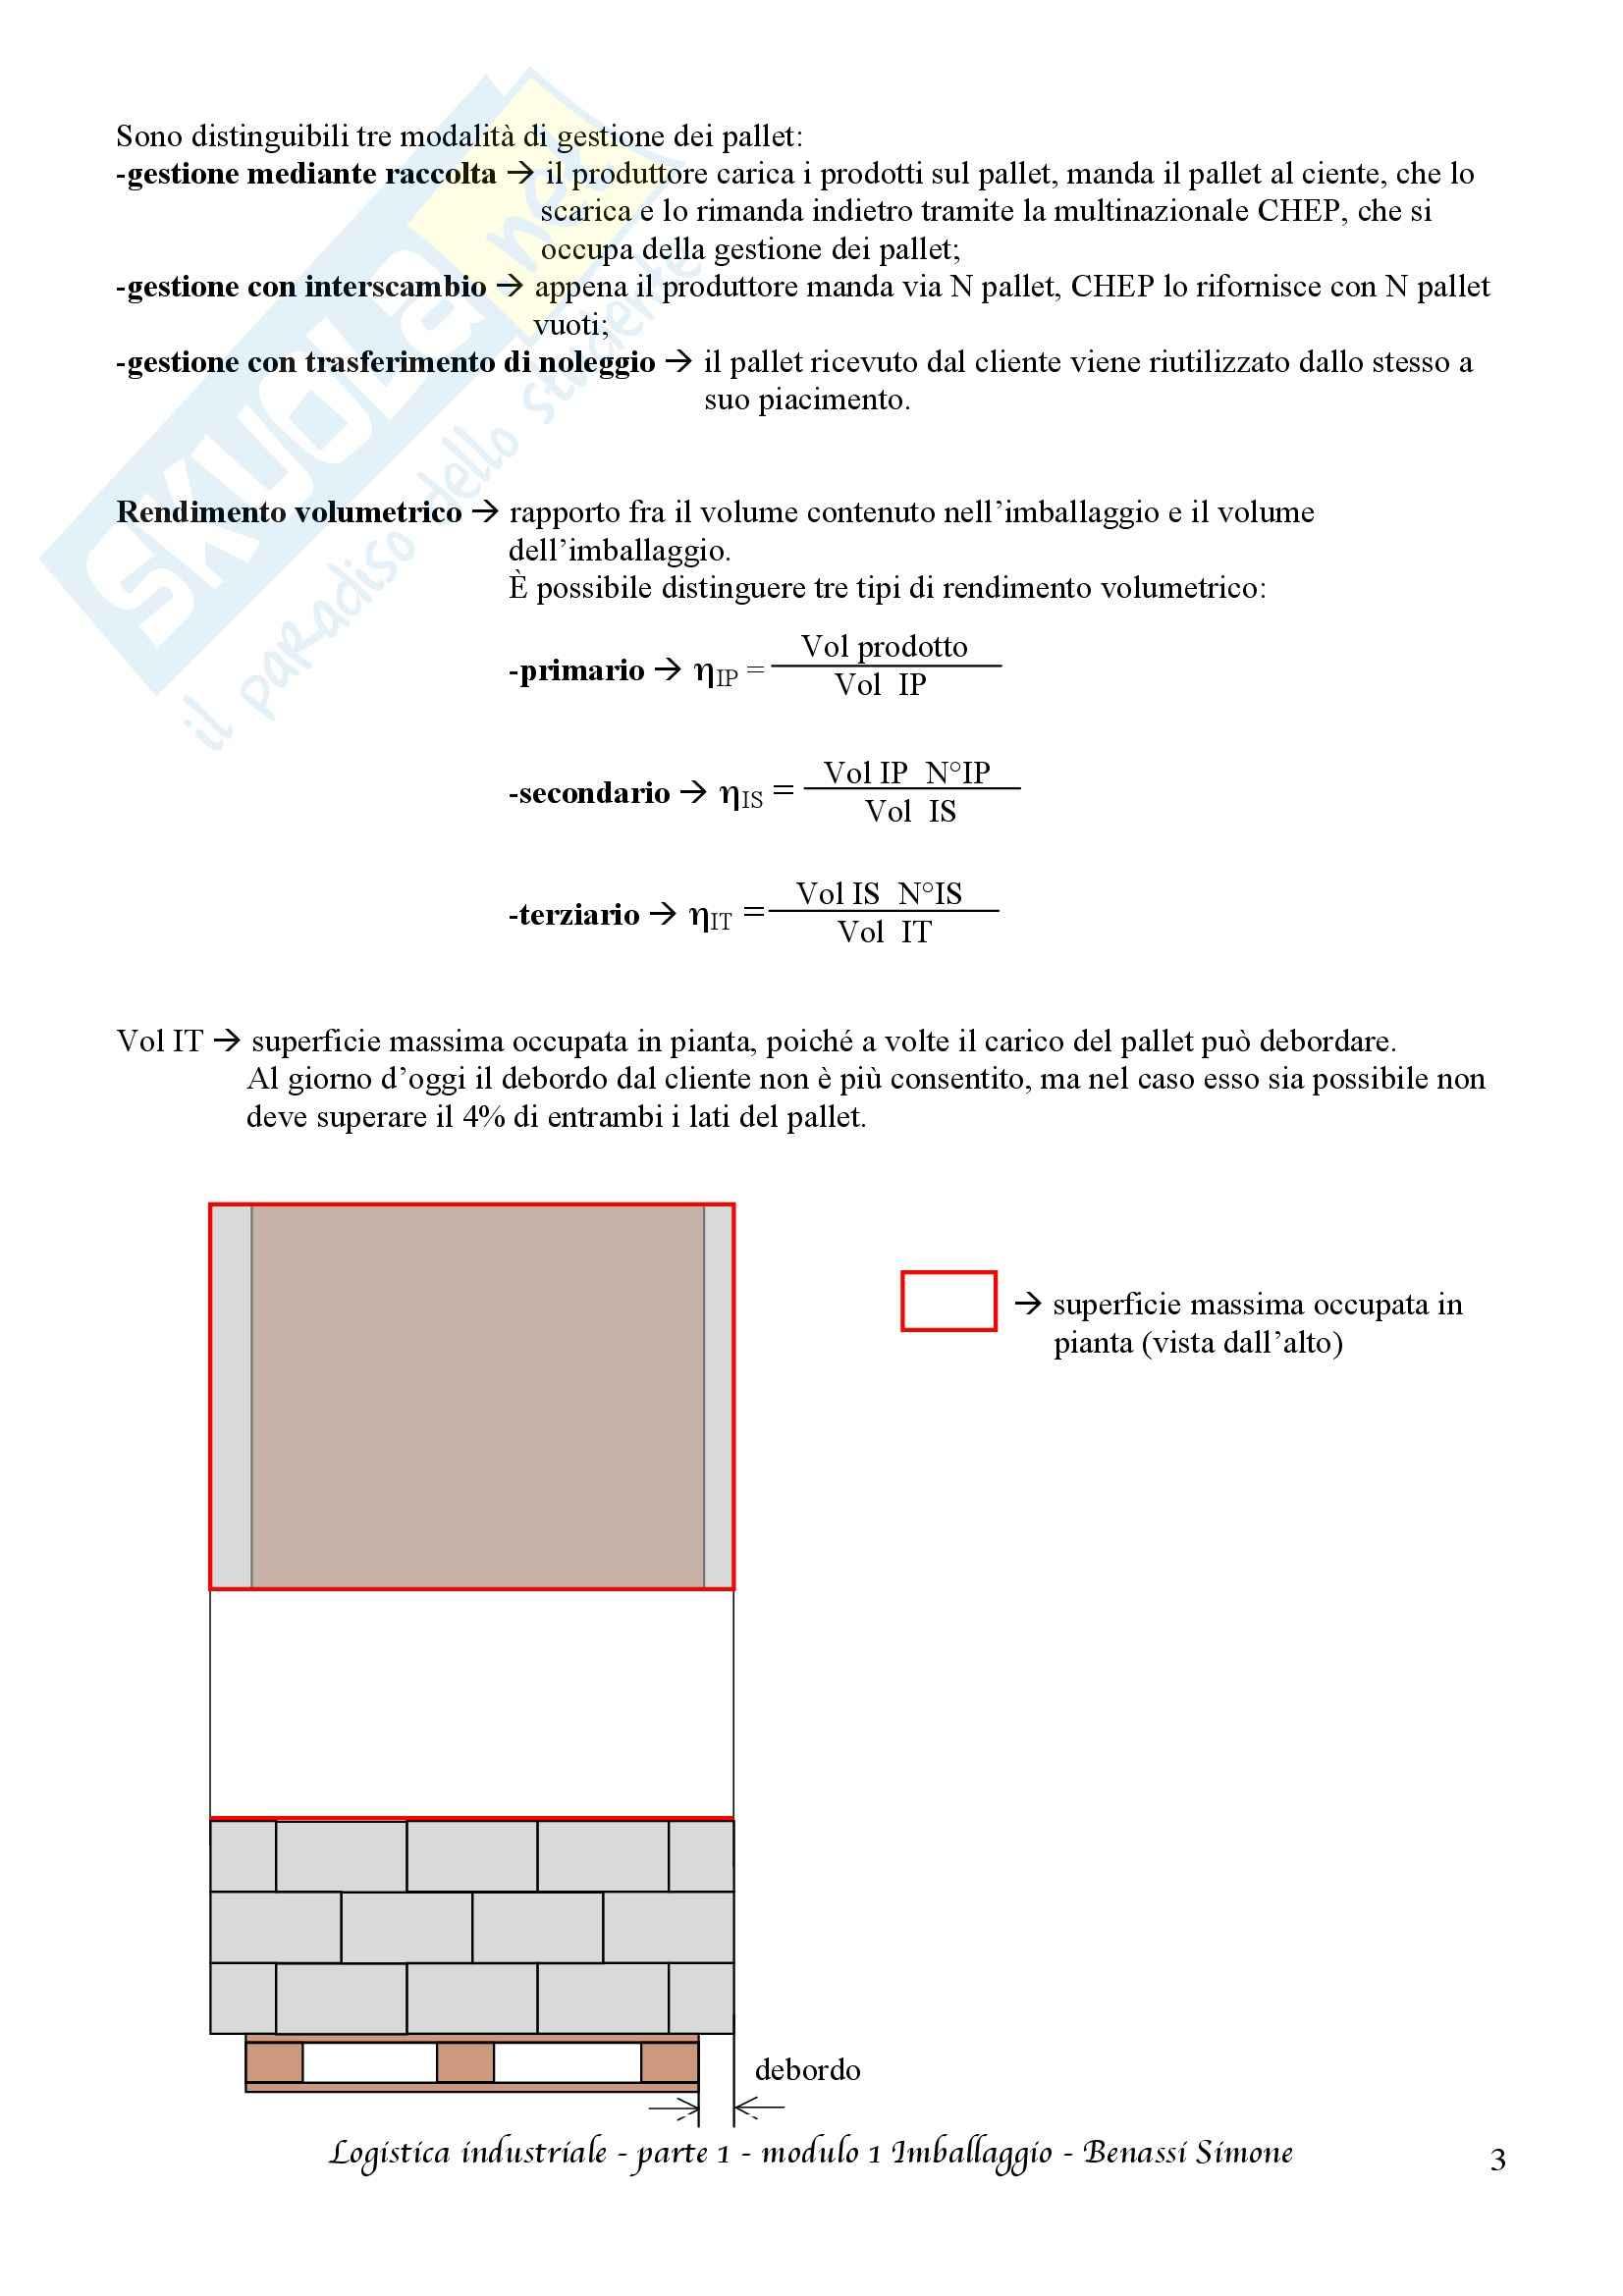 Logistica industriale T-AB - Appunti prima parte Pag. 6